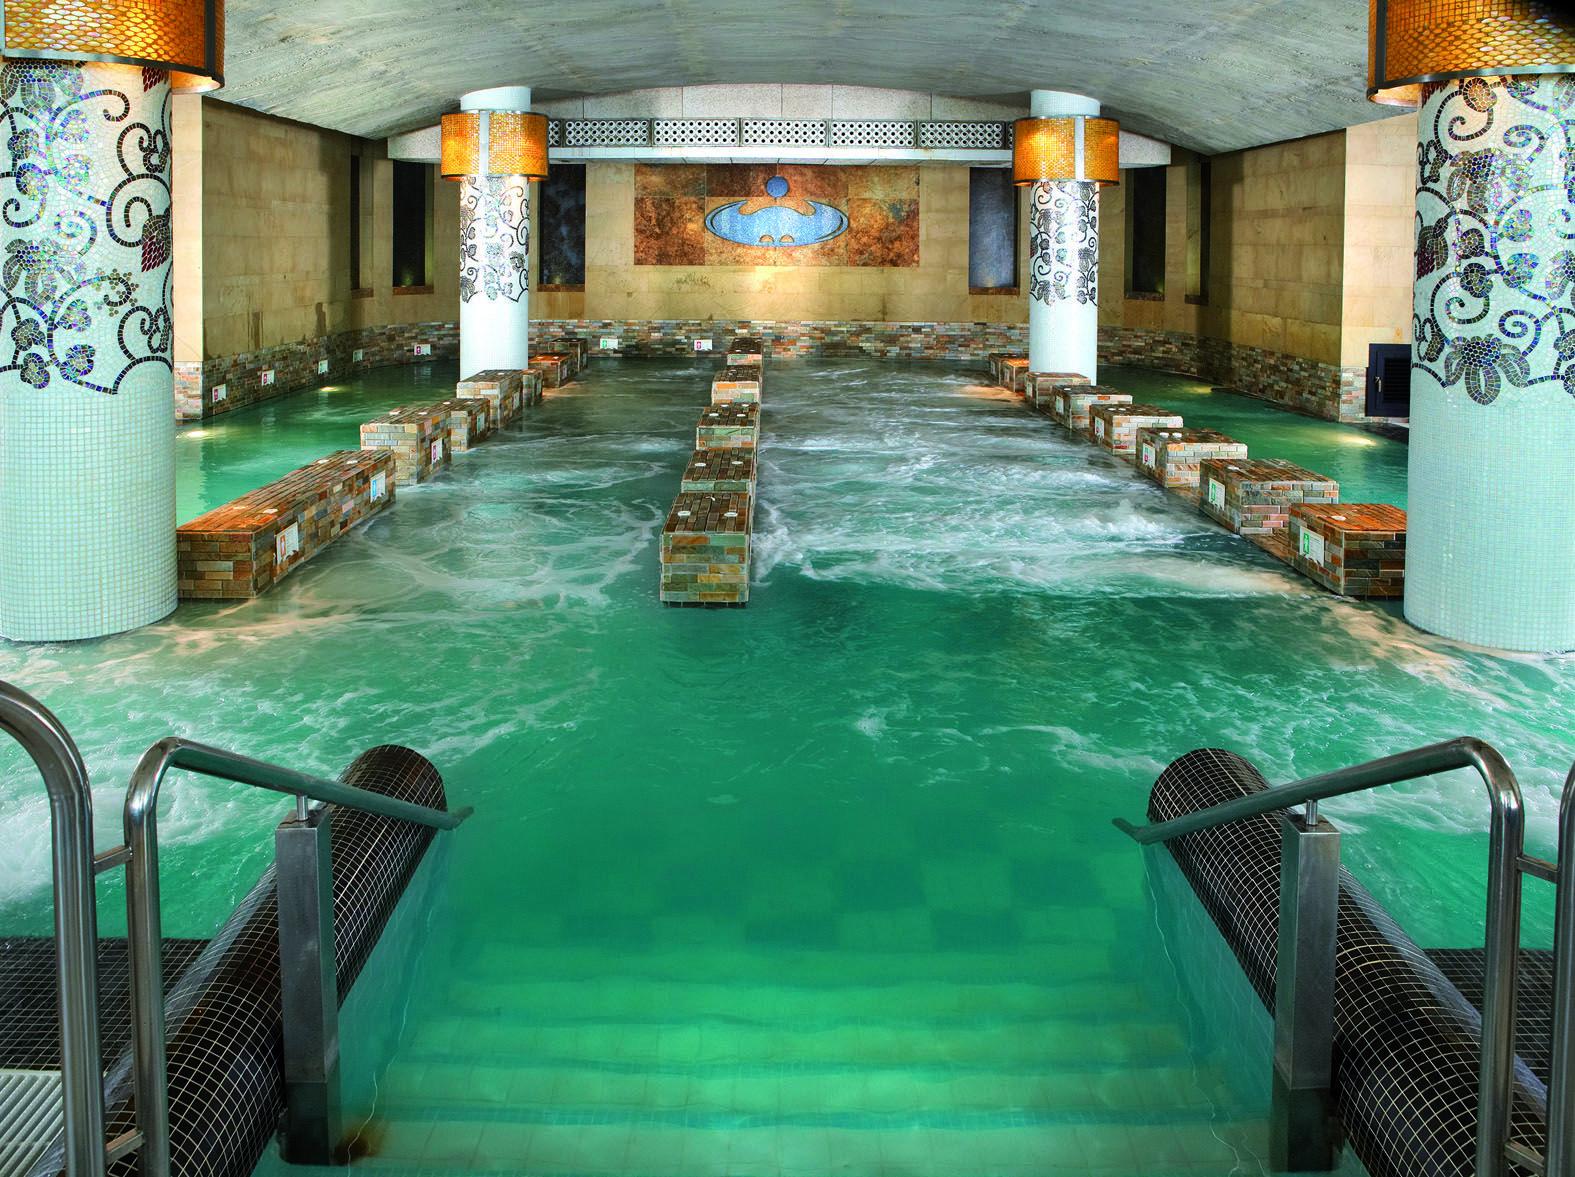 San Sebastian La Perla Spa Baths Piscina De Hidroterapia Do The Circuit Here Amazing Perlas Balneario Piscinas